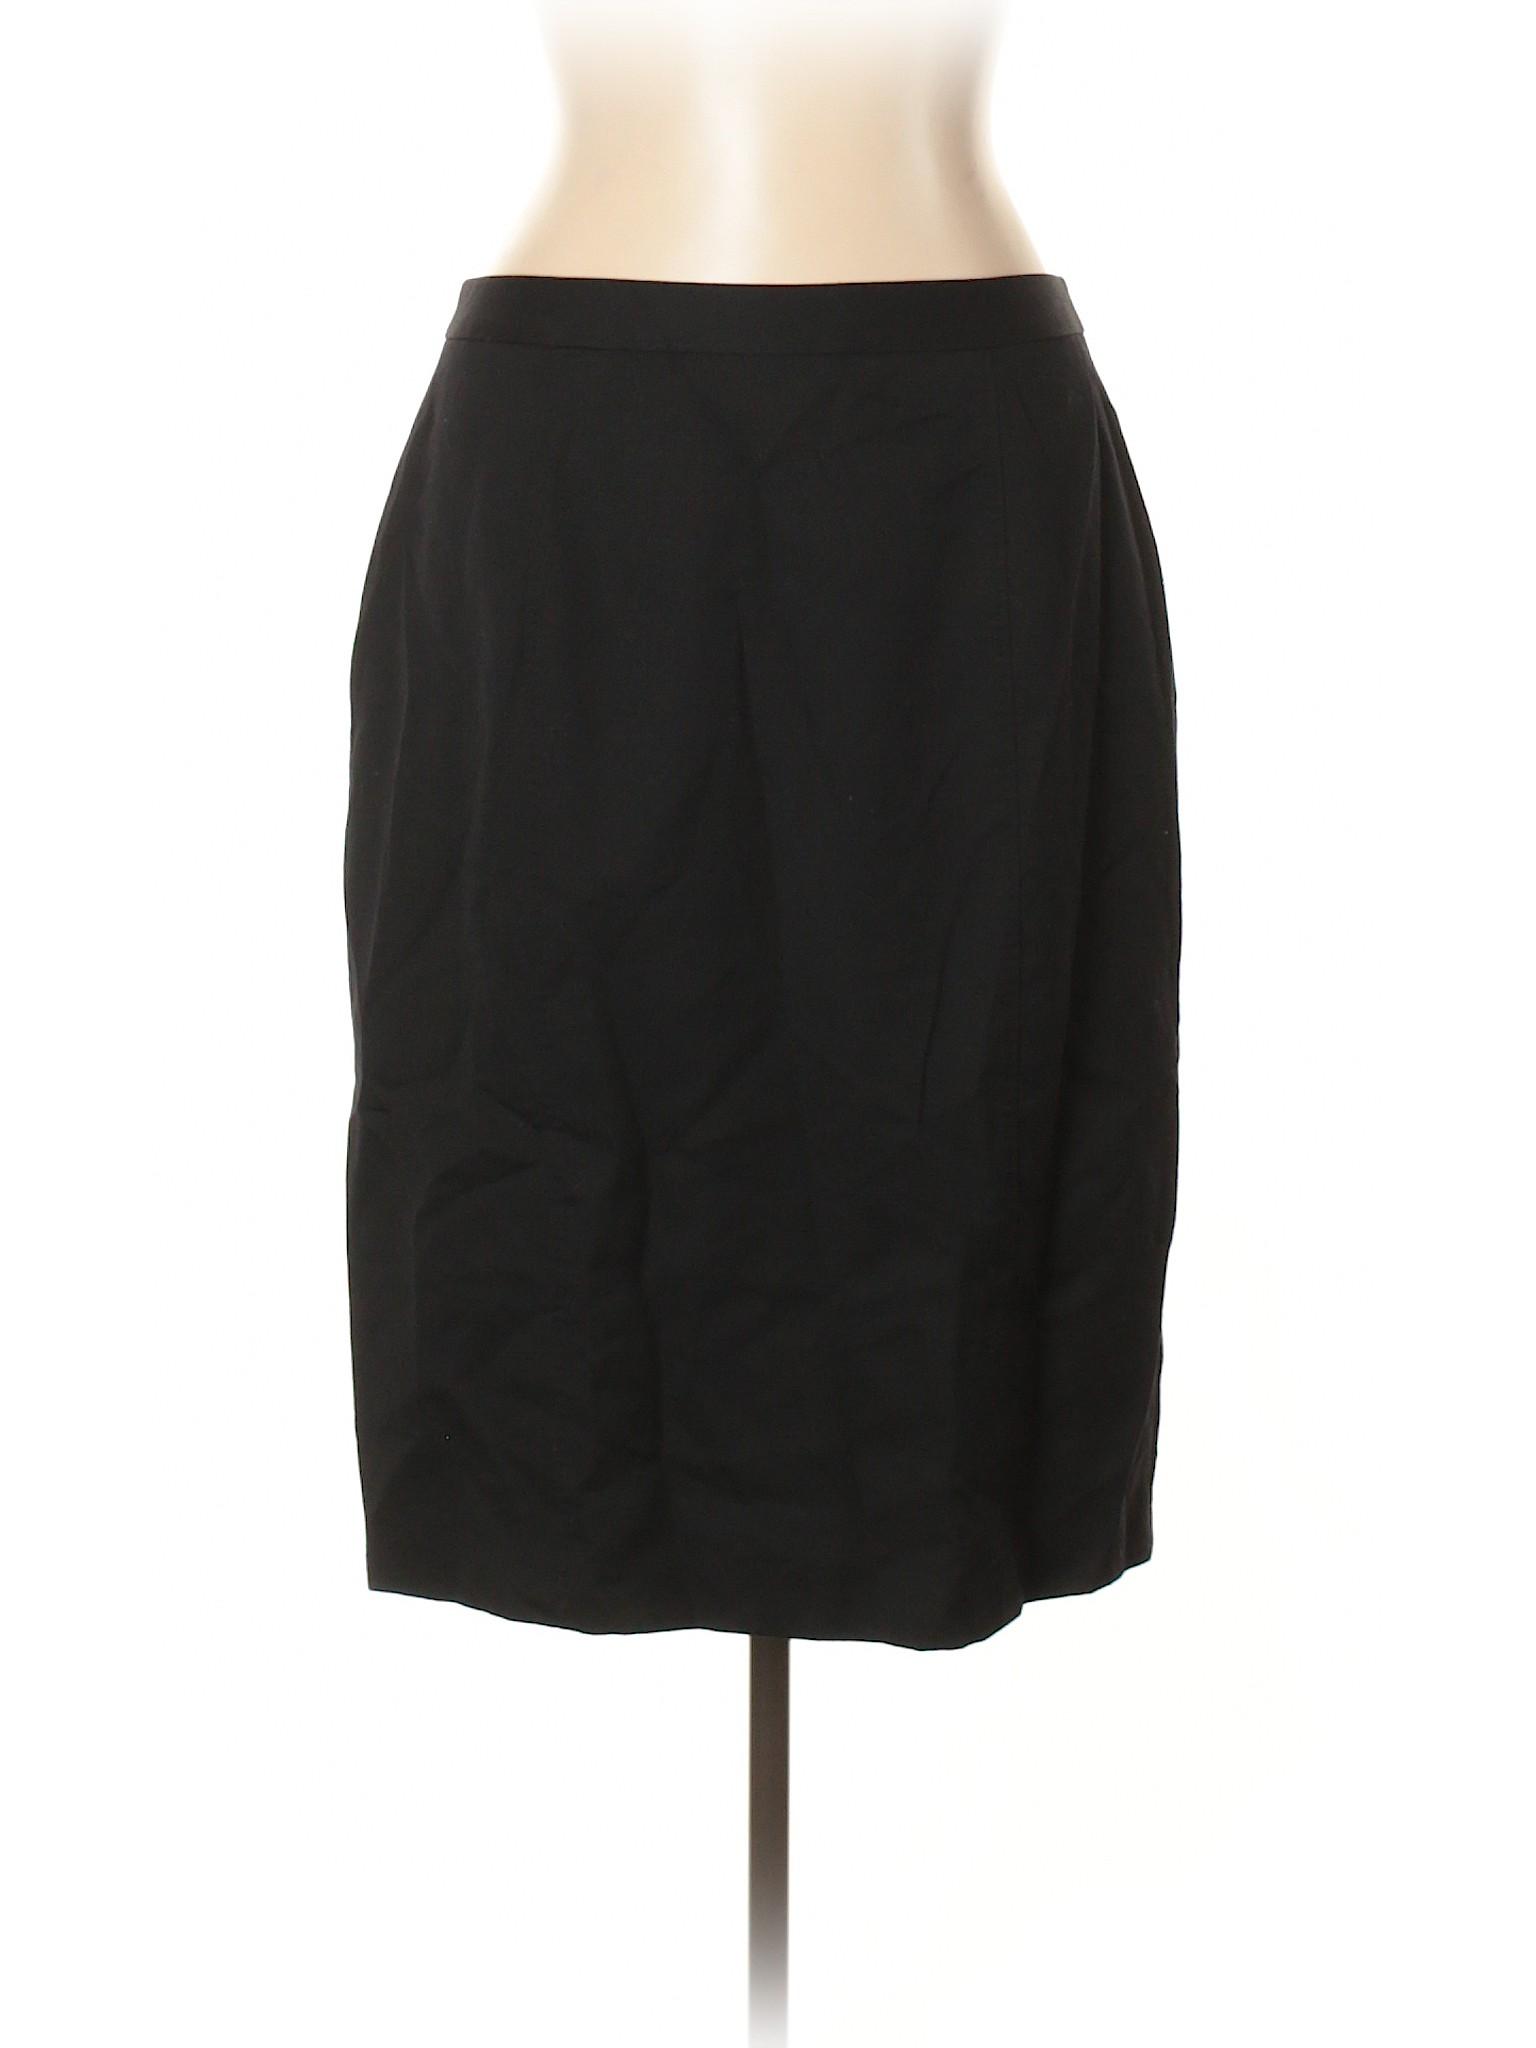 Boutique Skirt Skirt Boutique Casual Skirt Casual Boutique Boutique Casual Skirt Casual Casual Boutique vwHxA7g